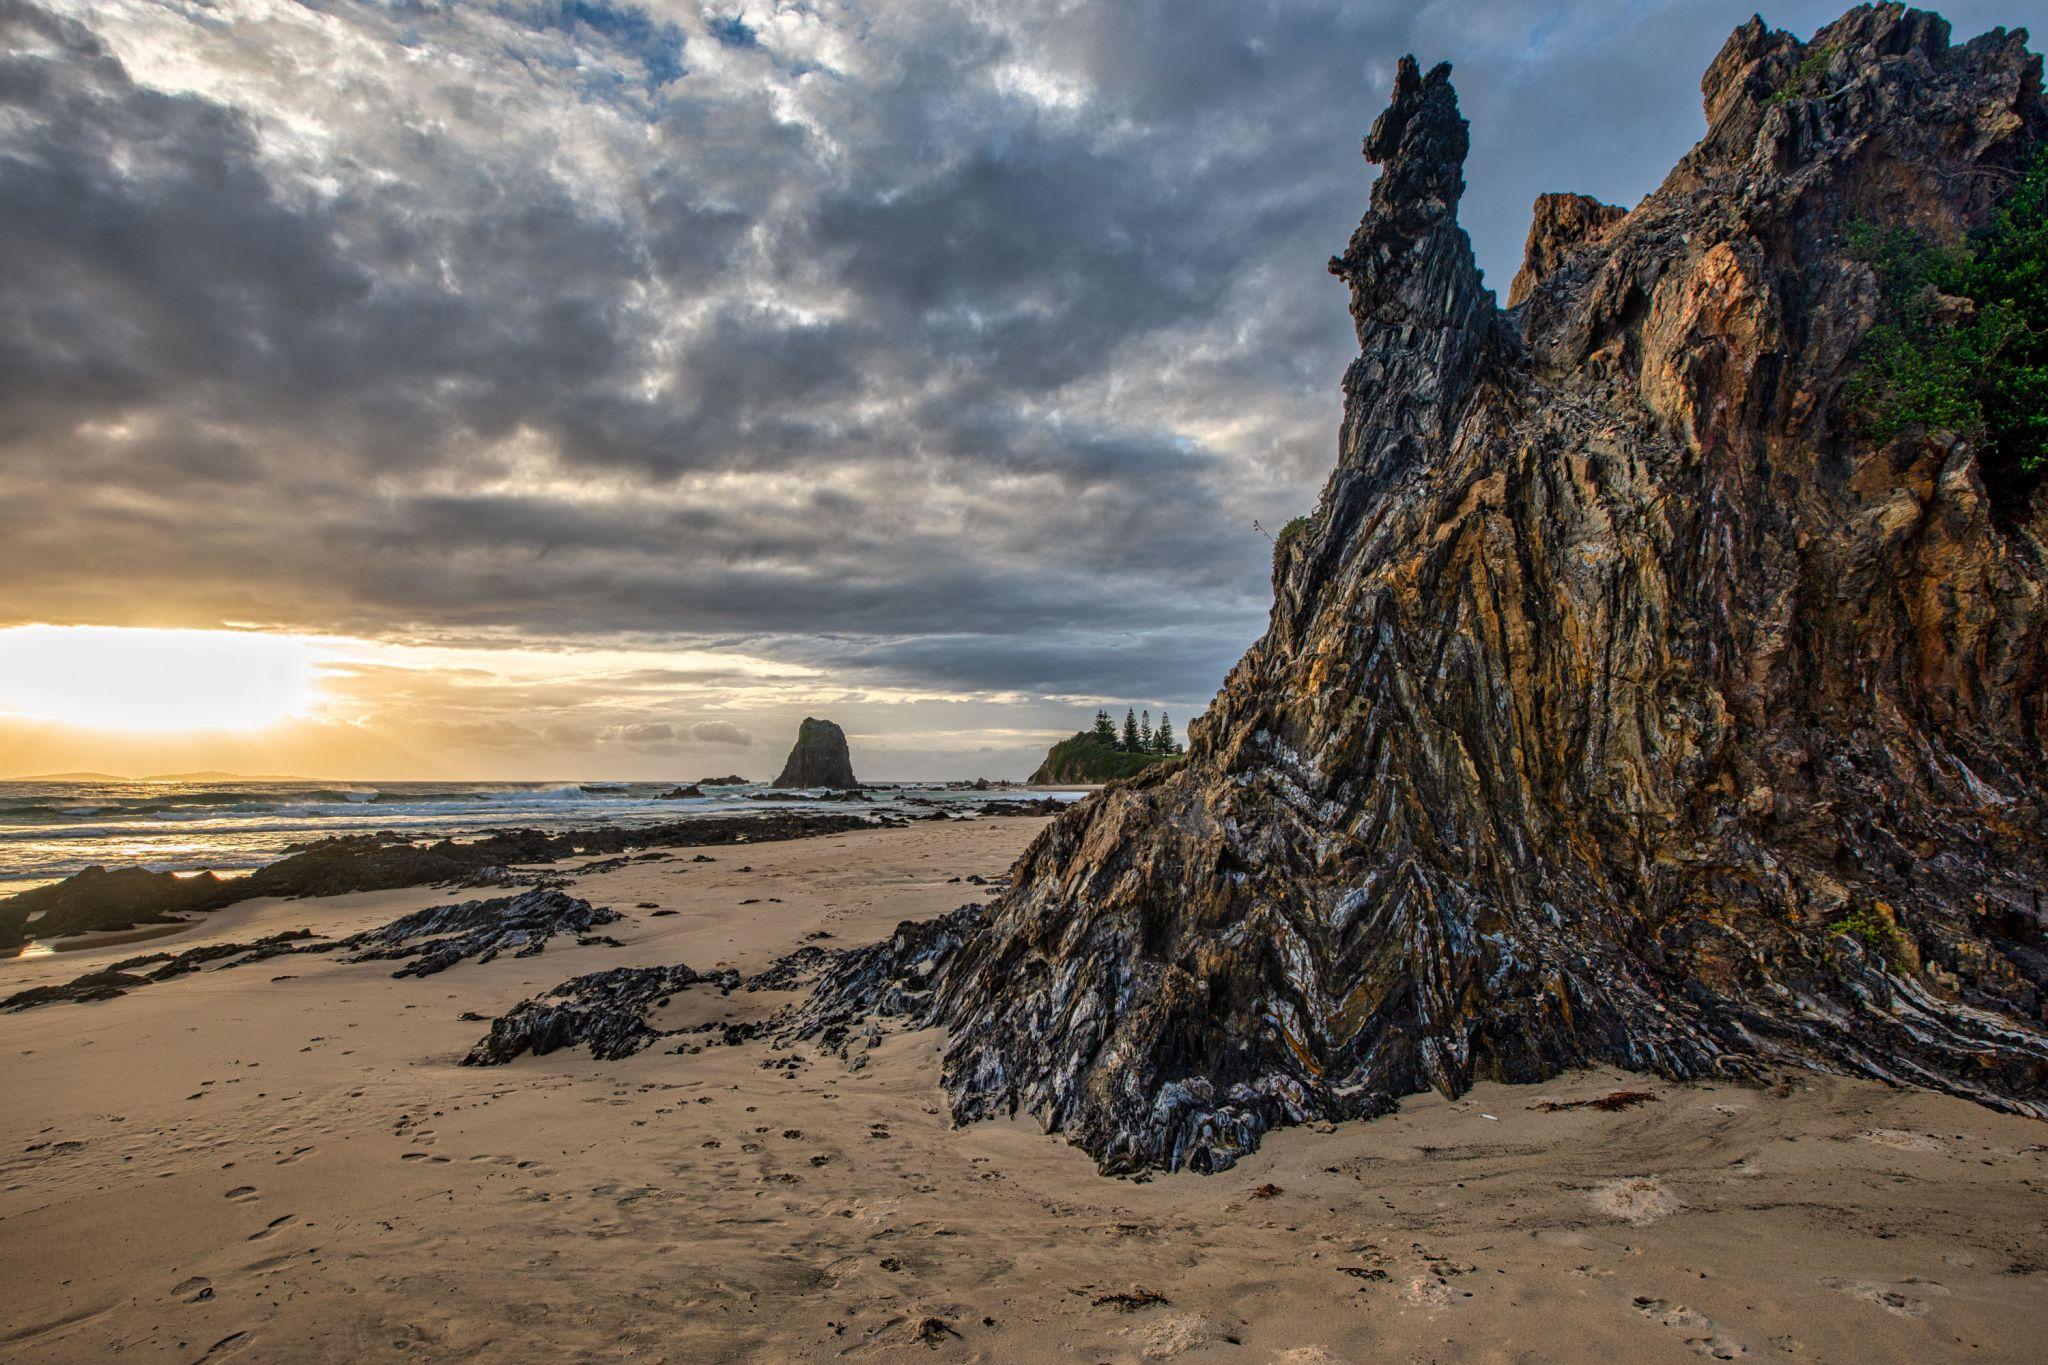 Patterned Rock Sunrise Glasshouse Rocks Narooma, Australia